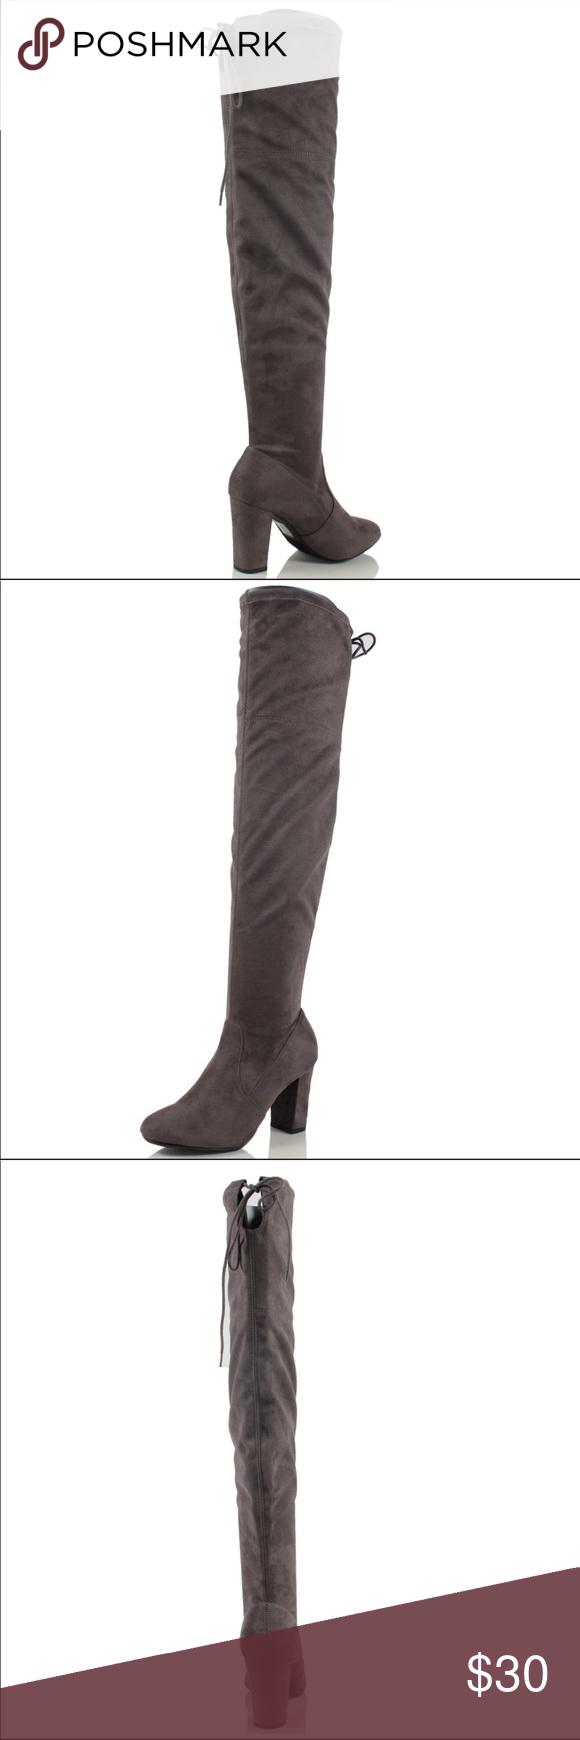 c5699a6b4b7 Gray Faux Suede Knee High Boots 4 inch heel. Dark grey suede. Worn ...